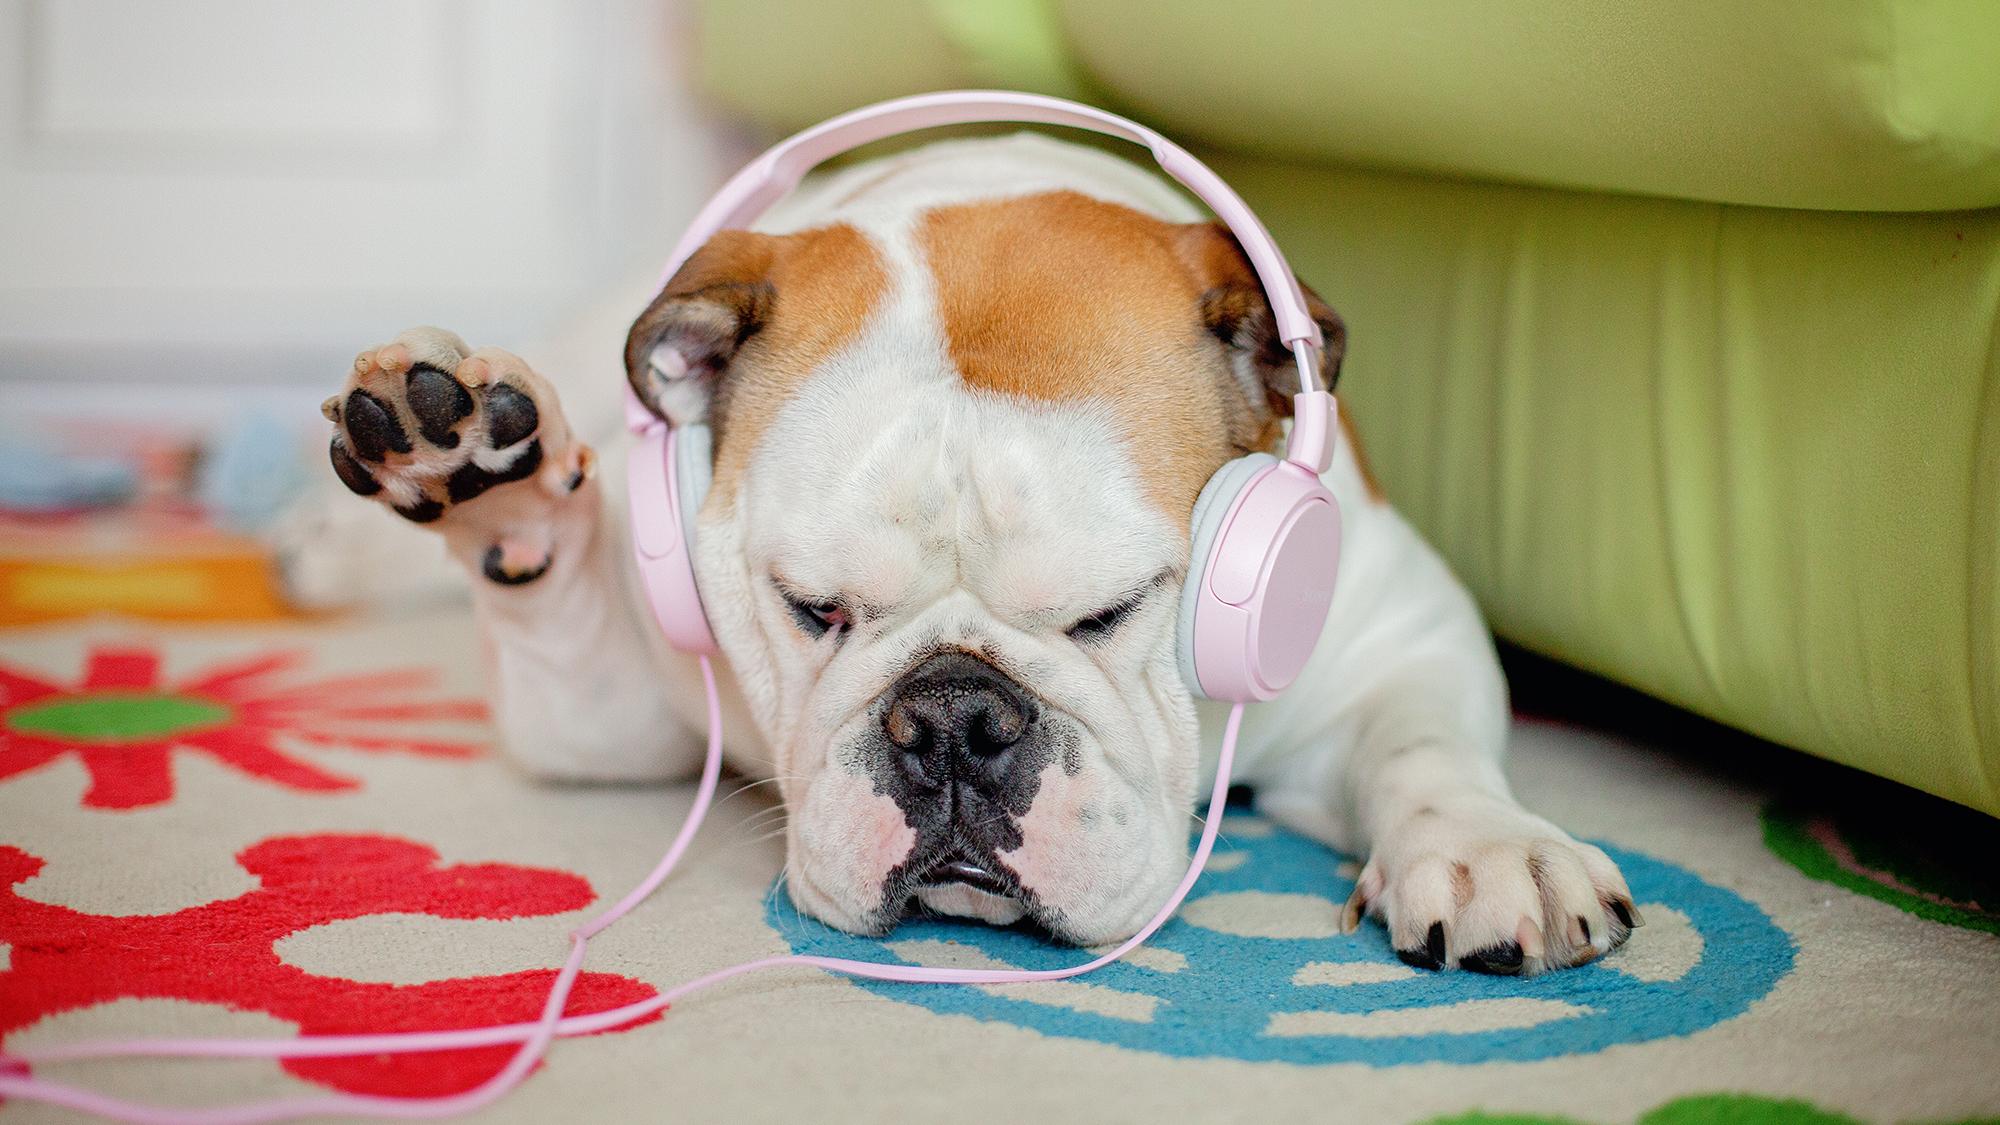 Introducing NPR Music Playlists